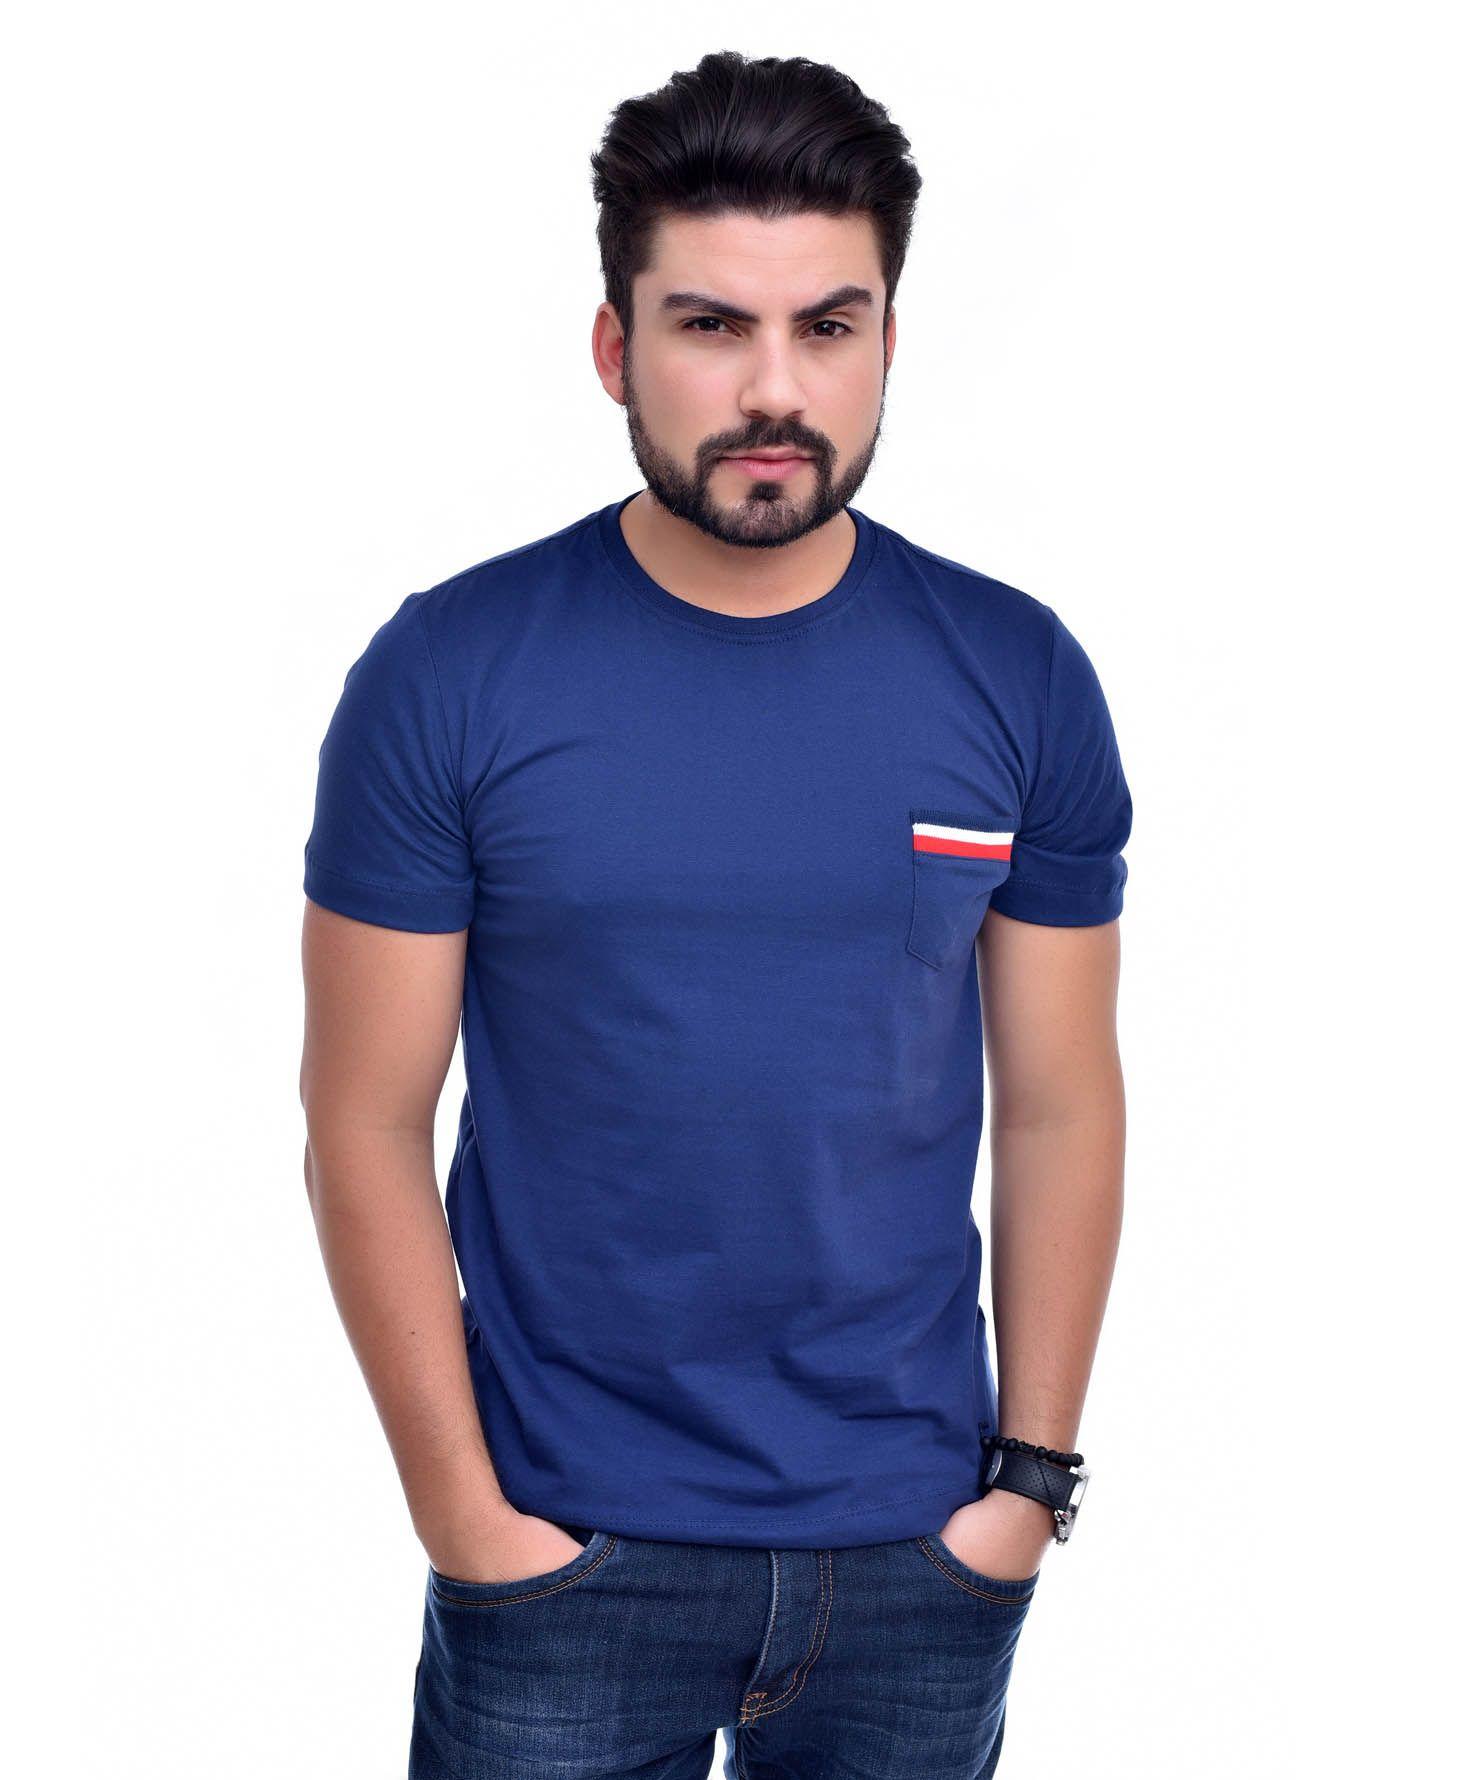 Camiseta Bolso TH Marinho / MR  - Ca Brasileira